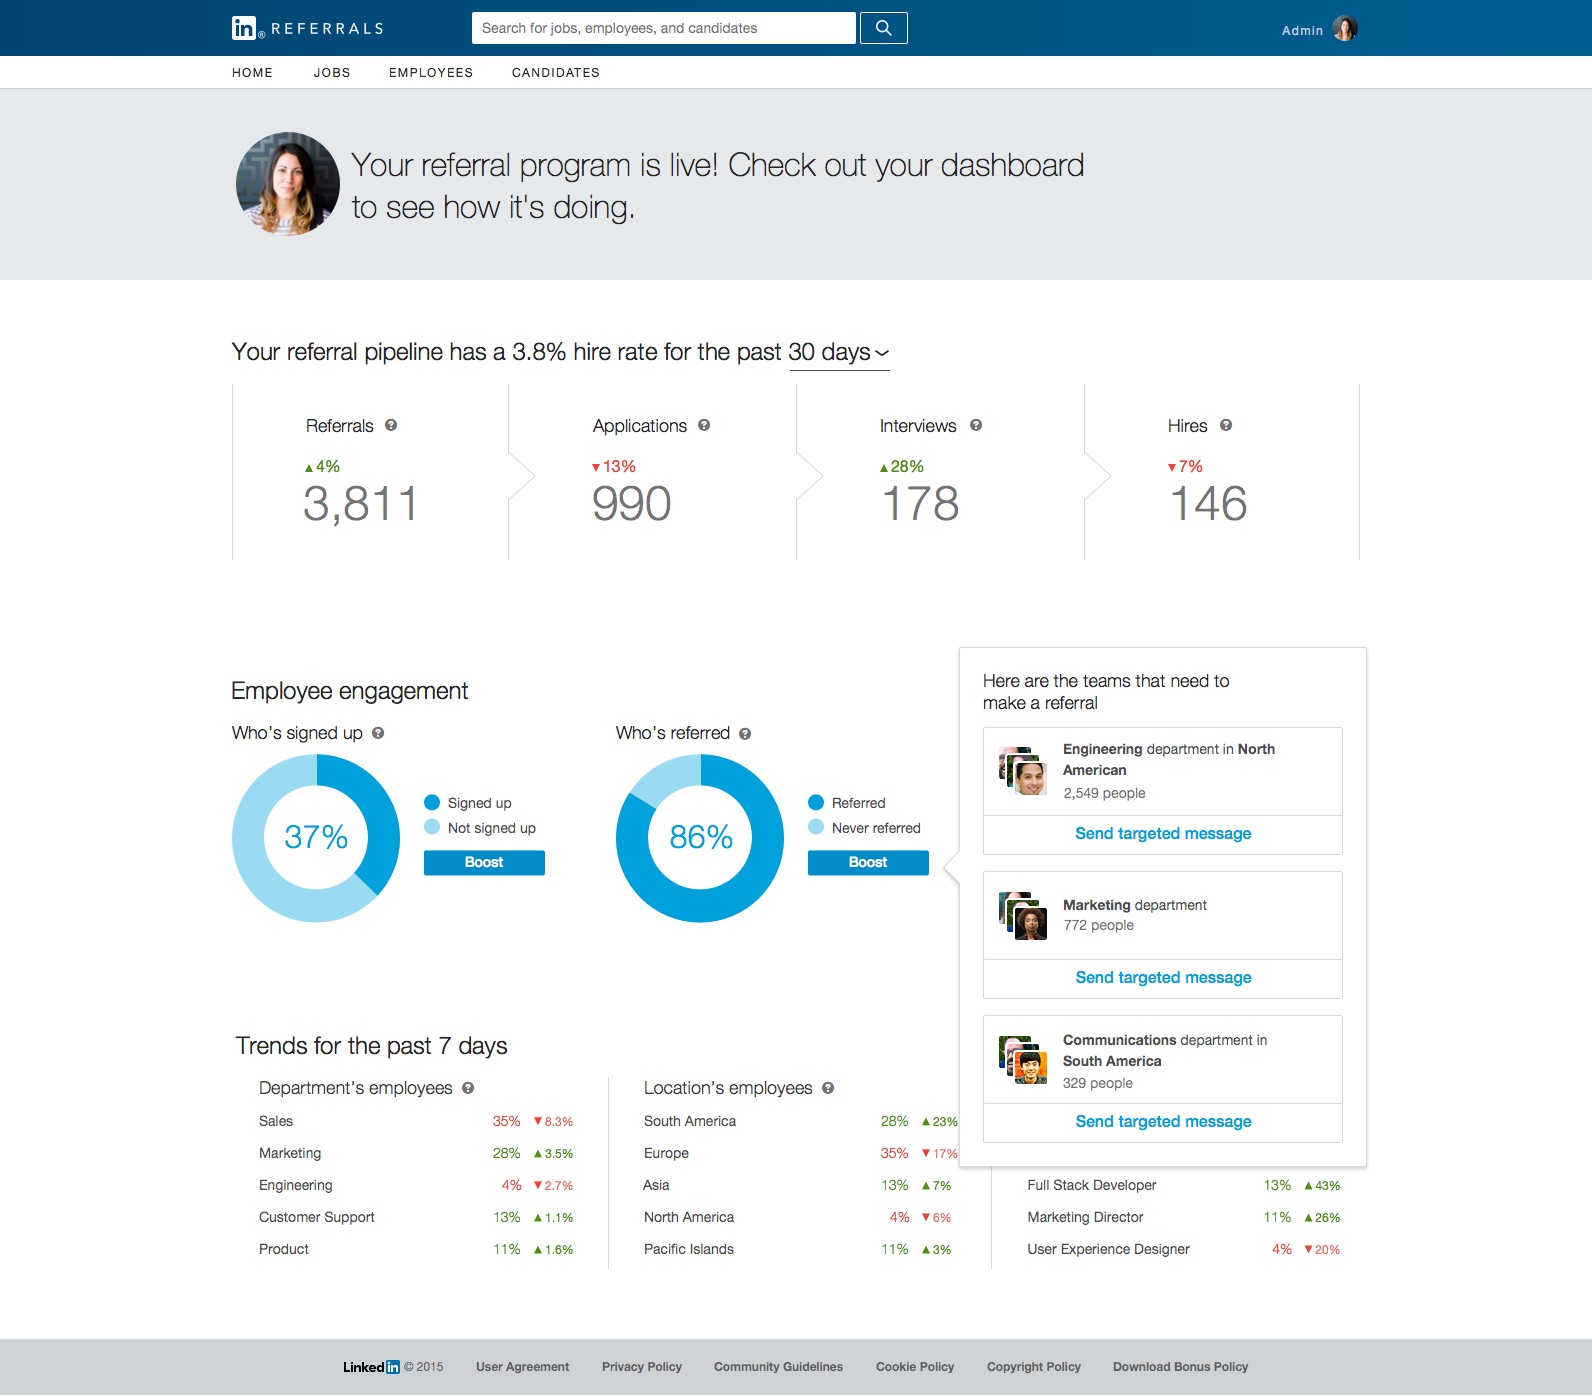 LinkedIn Referrals Admin Dashboard